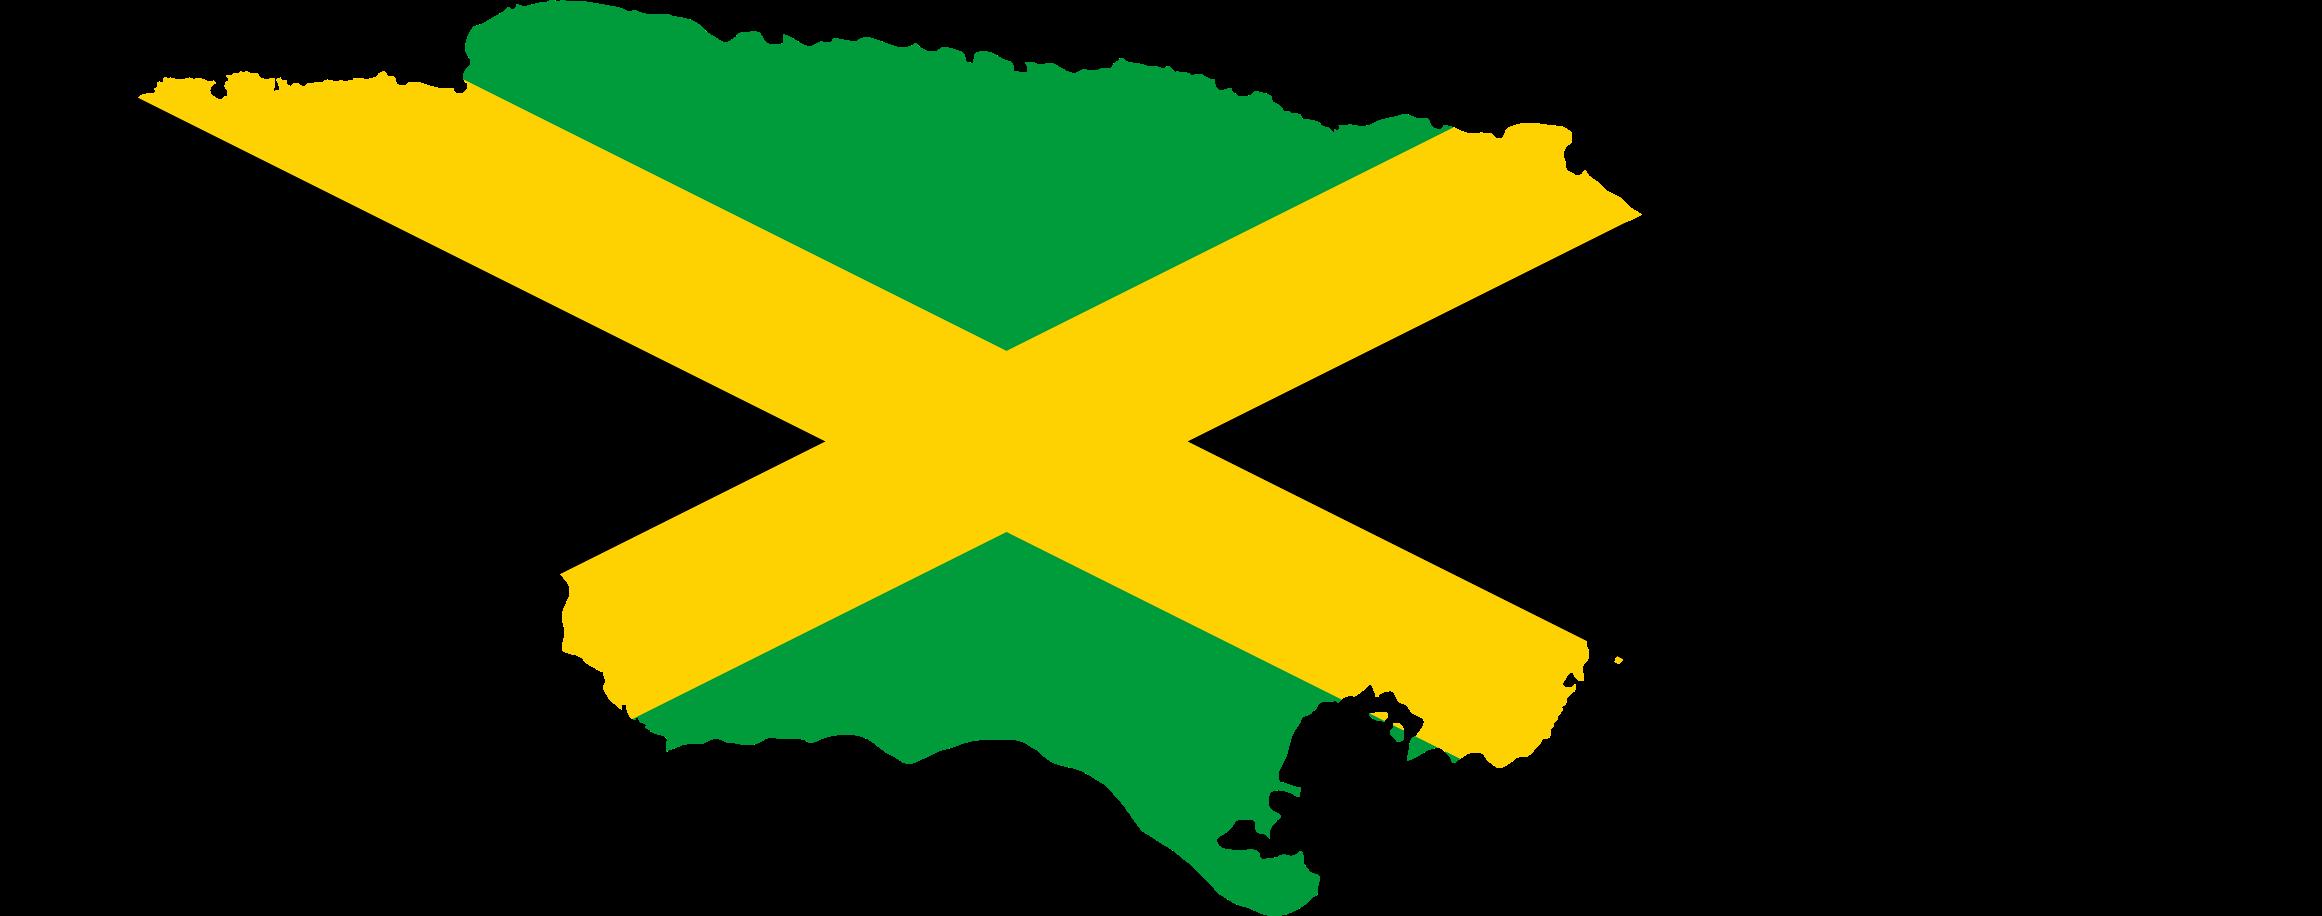 Welcome to Jamaica